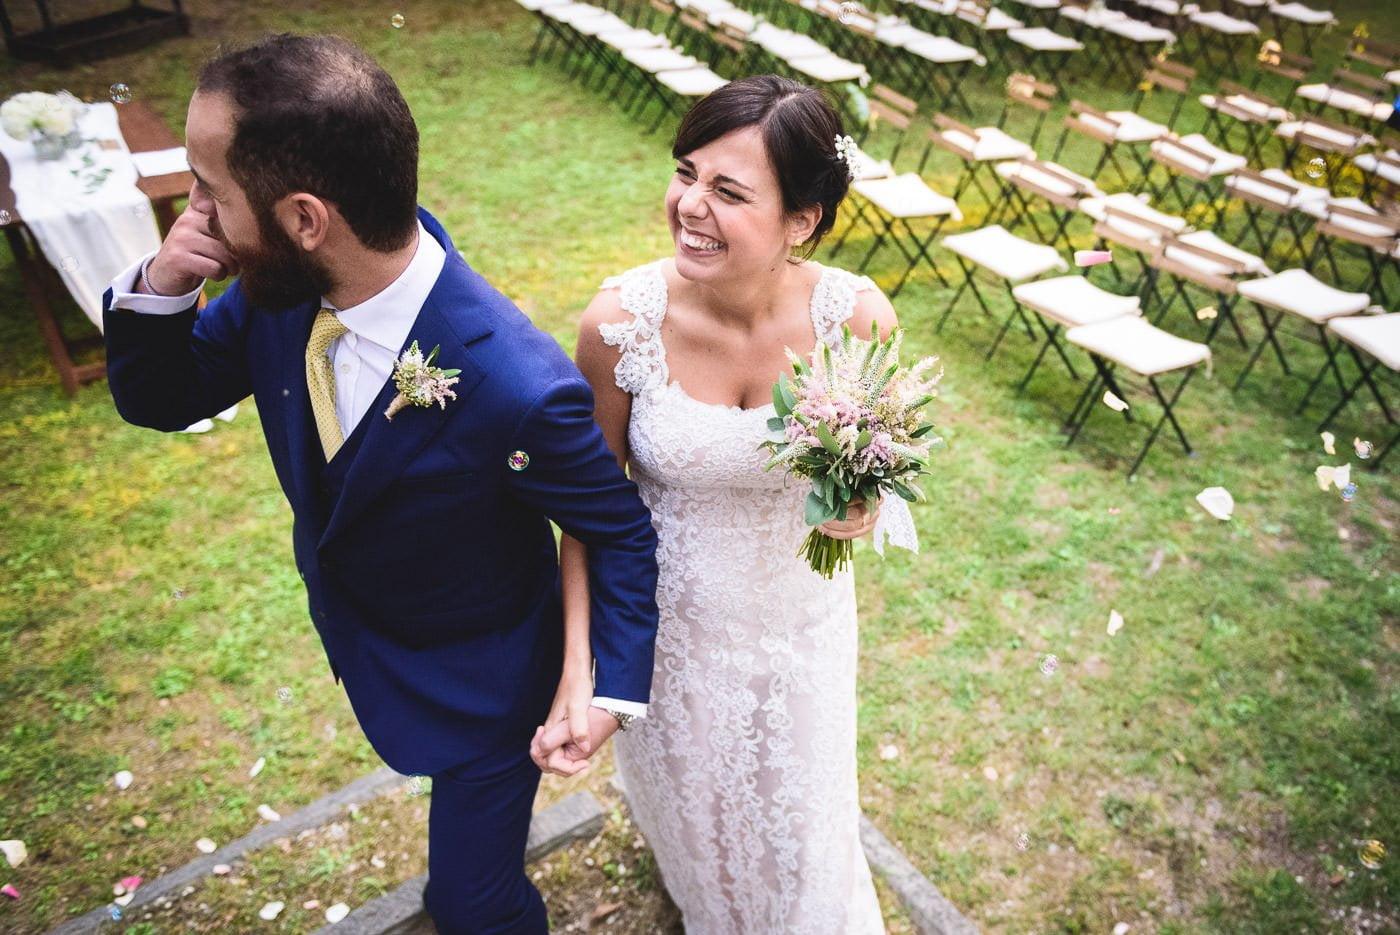 Matrimonio Giulia & Federico 09_15 – Alessio Nobili Photographer-36